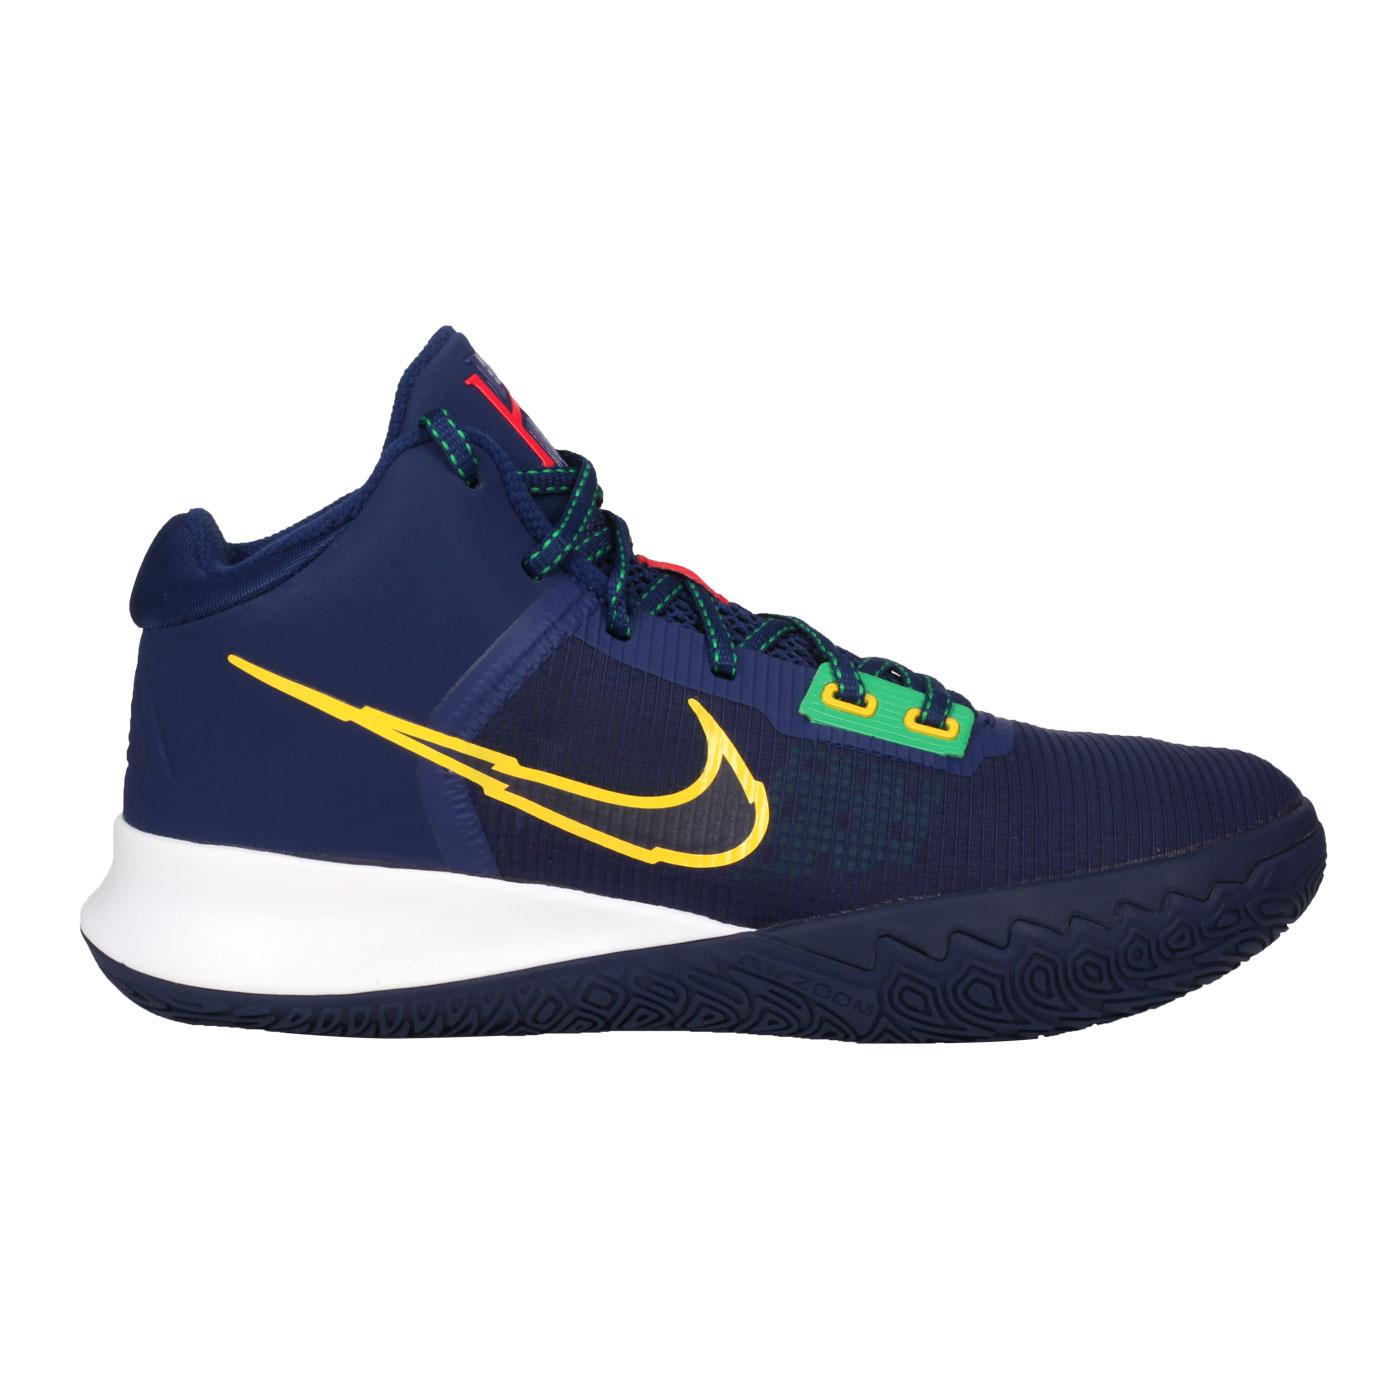 NIKE 男款籃球鞋  @KYRIE FLYTRAP IV EP@CT1973400 - 藍黃綠